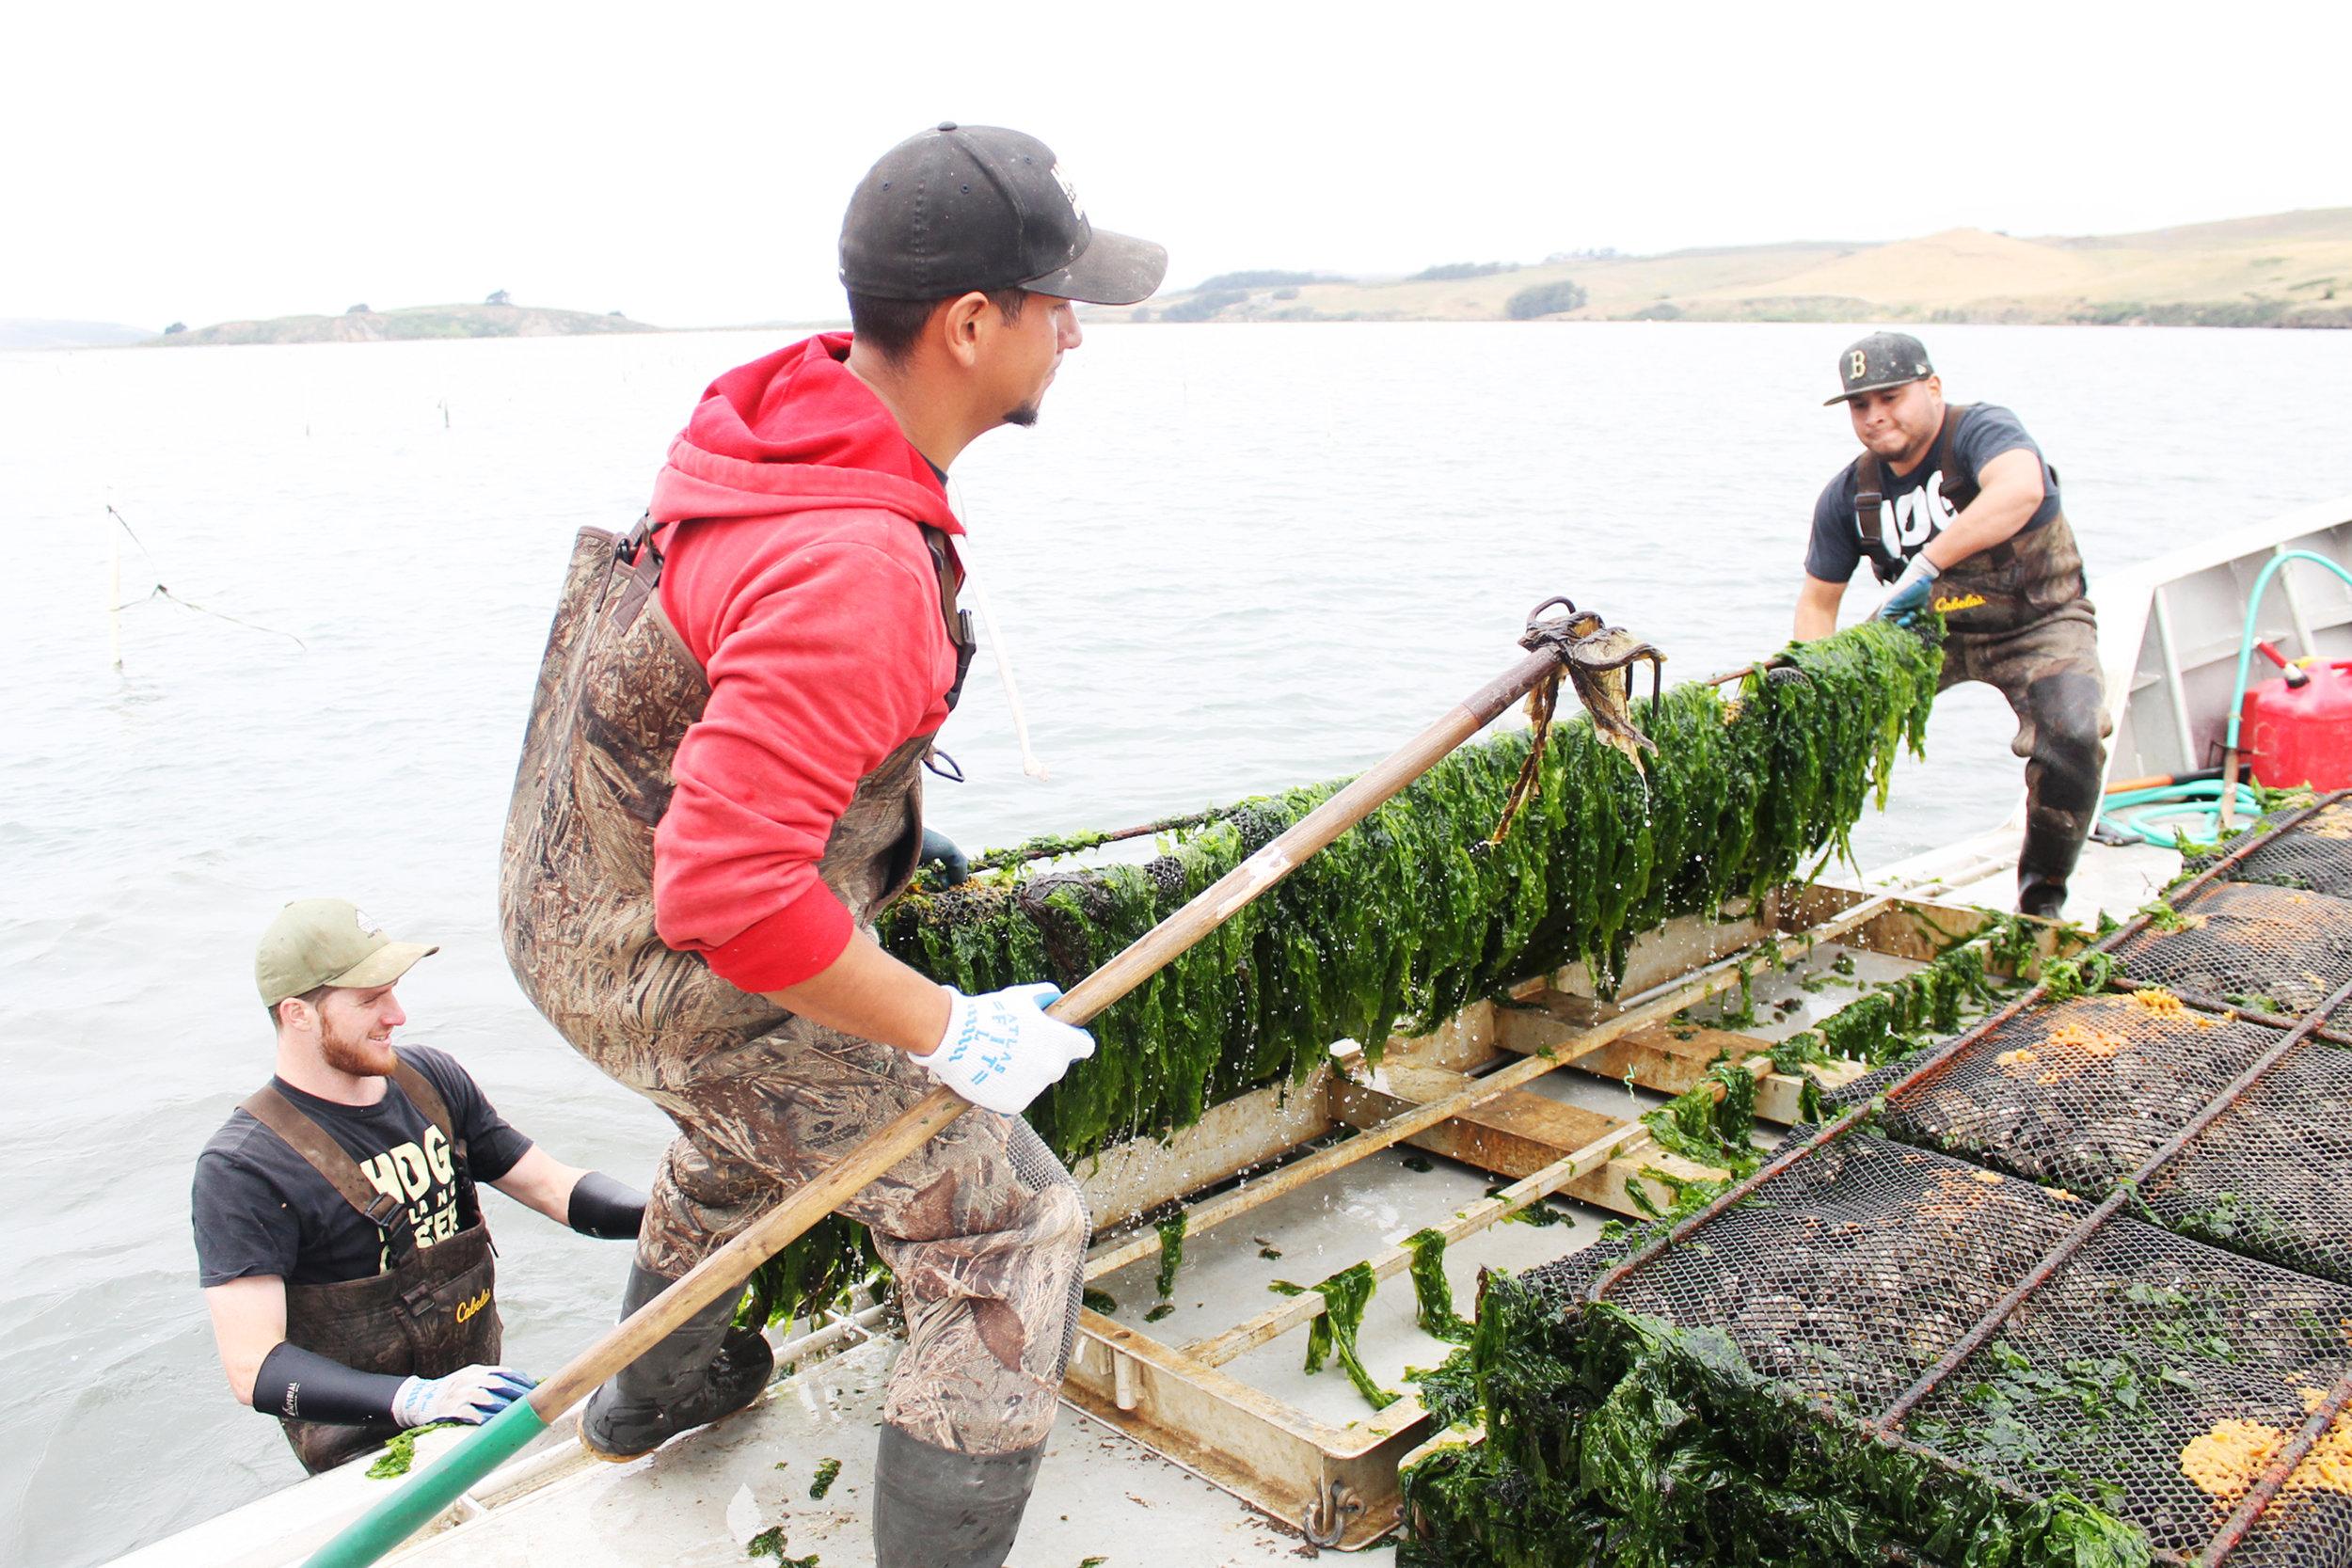 Photo Credit Remy Galvan Hale. Courtesy Hog Island Oyster Co. Harvesting Racks_2.jpg